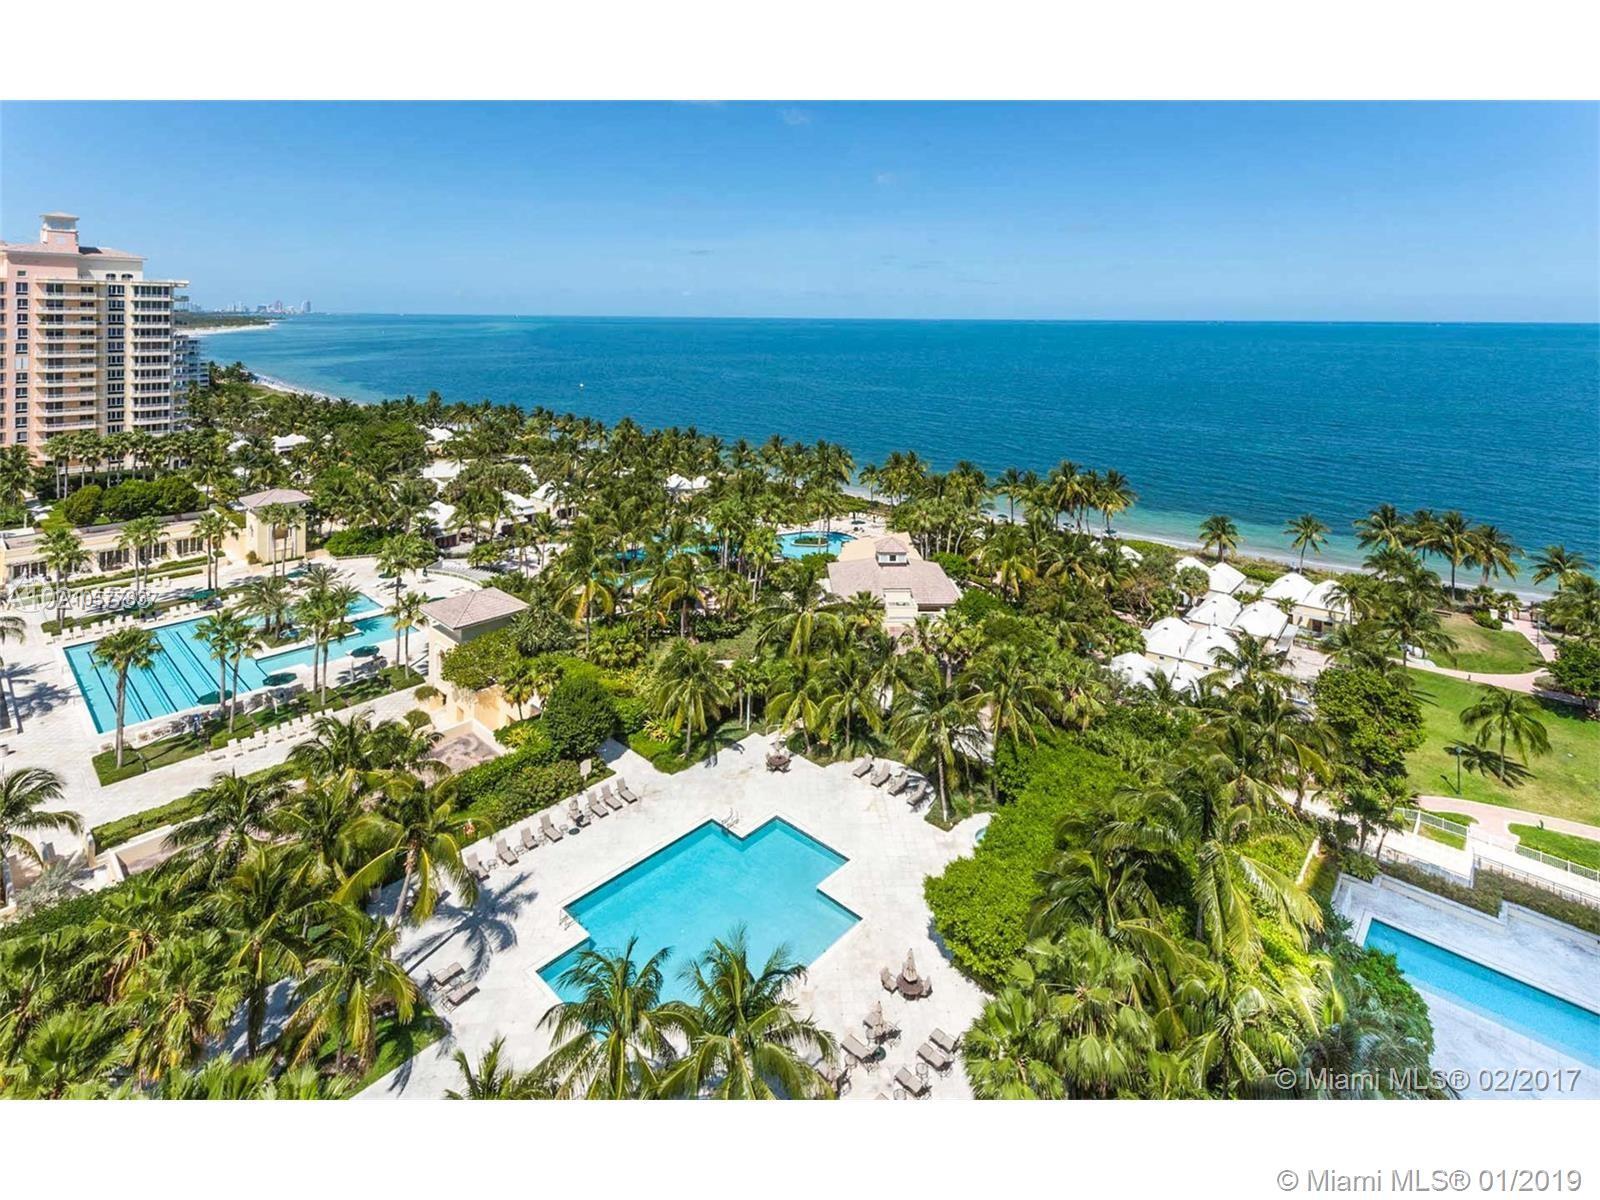 785 CRANDON BLvd, Key Biscayne, Florida